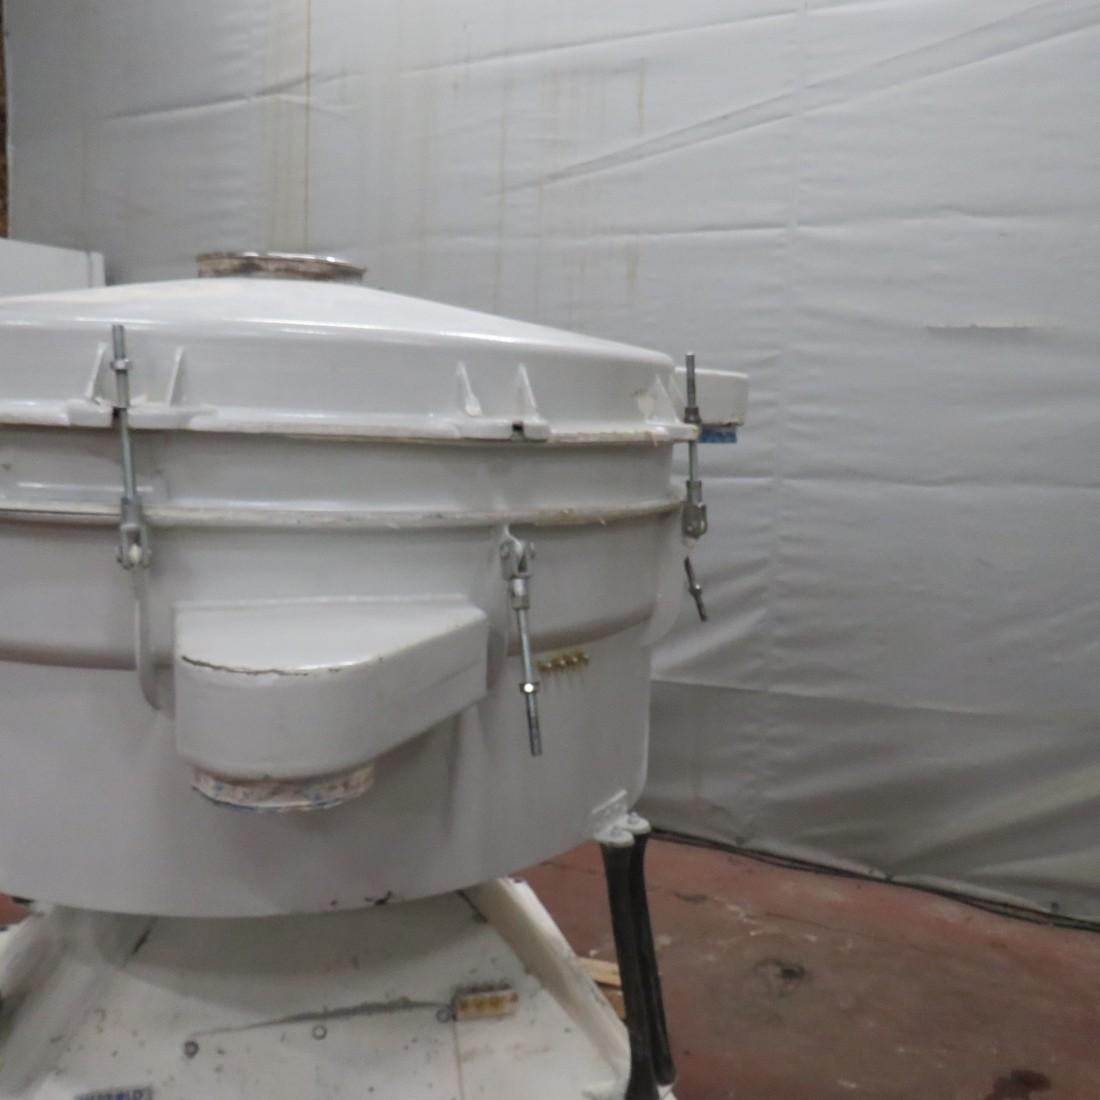 R6SA1130 Mild steel HERBOLD circular sieve TSM 1600 2 decks diam 1580 mm